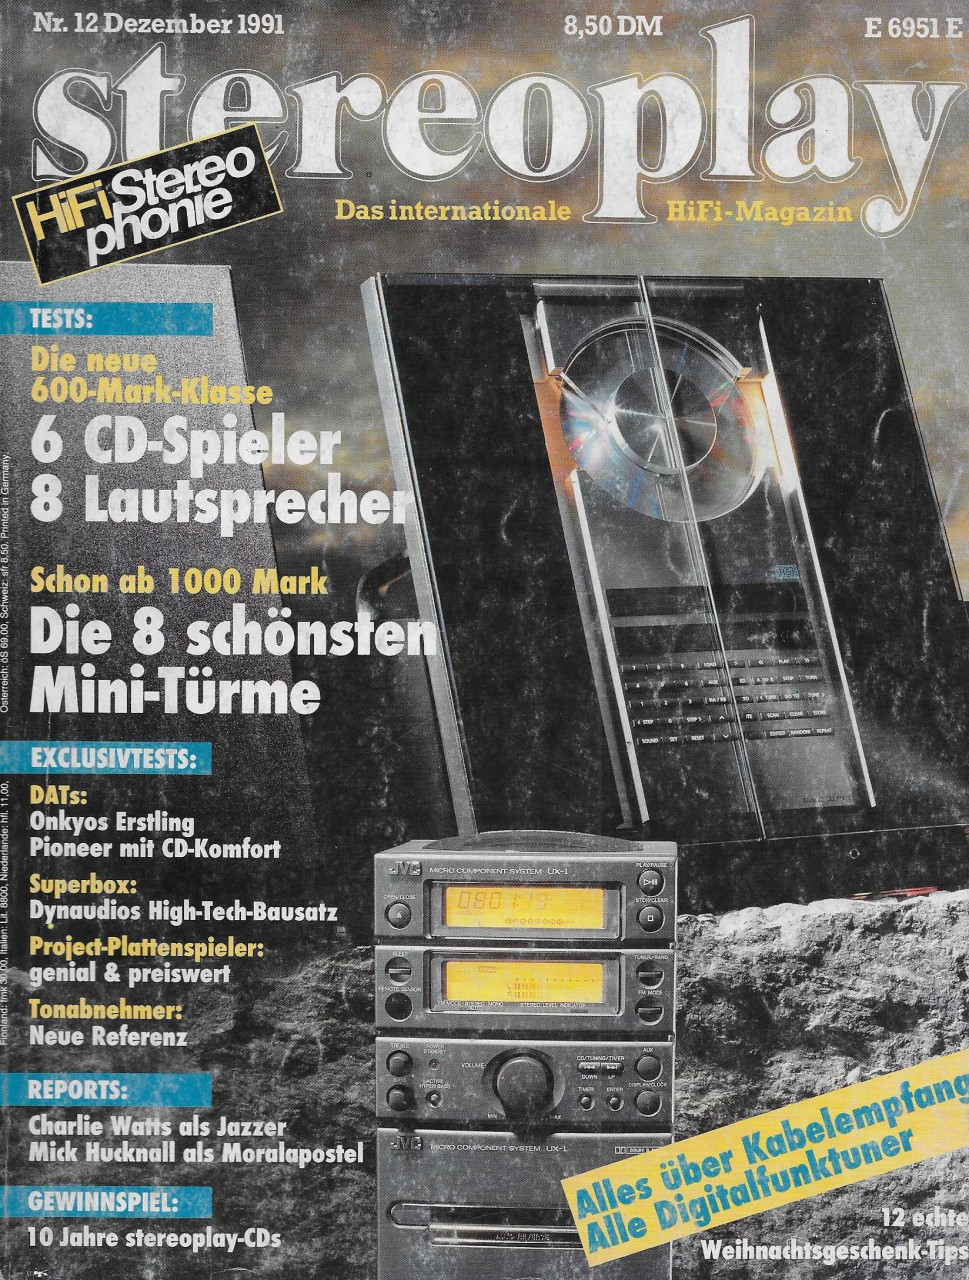 Stereoplay 12/1991 Zeitschrift | Stereoplay | Zeitschriften | Hifi ...